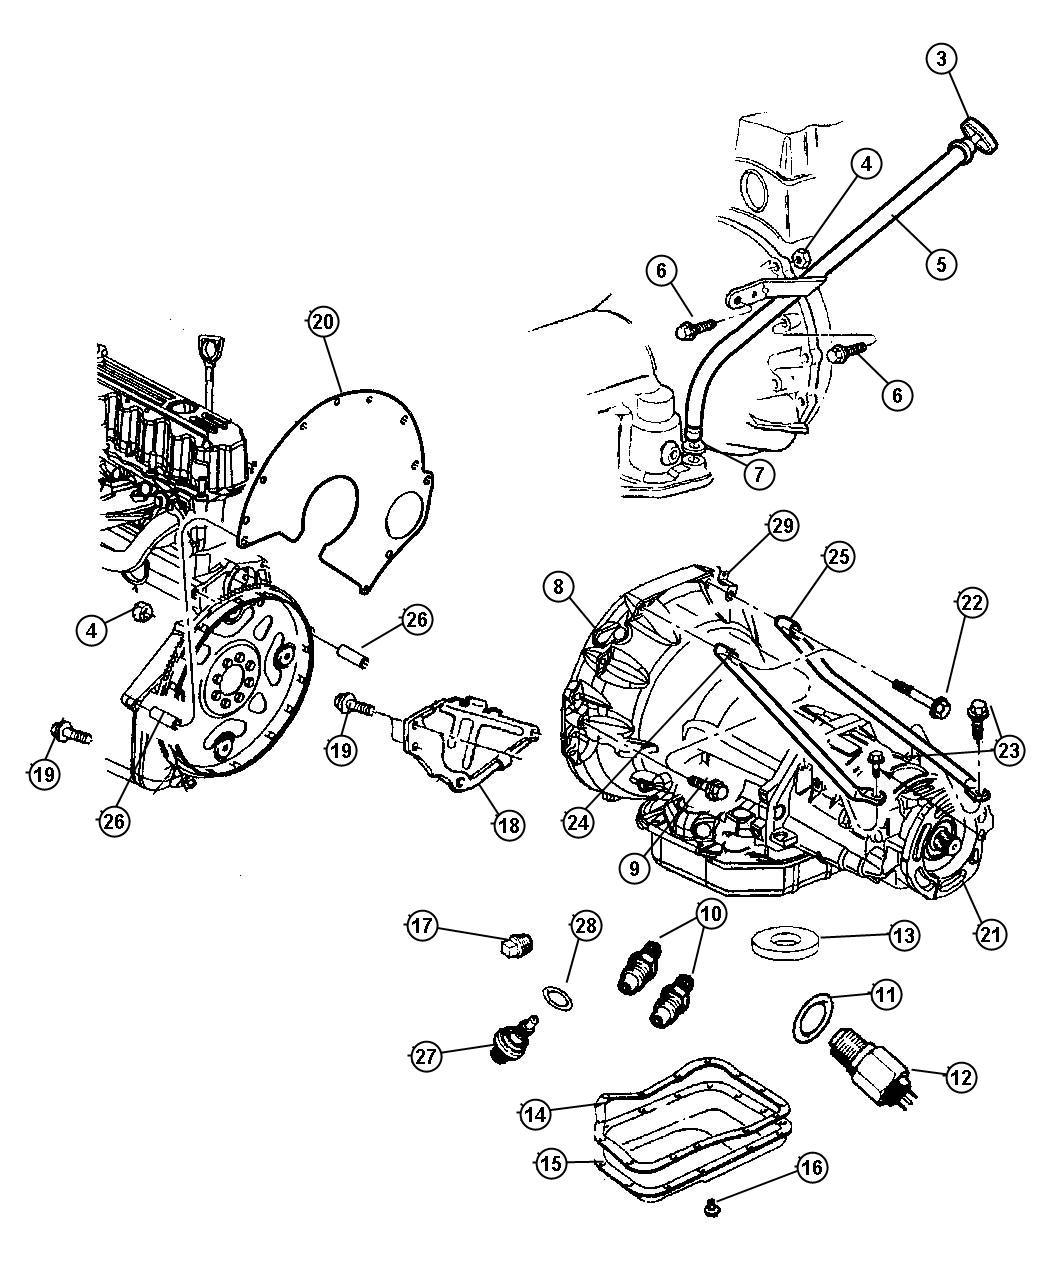 2008 Jeep Liberty SPORT Indicator. Transmission fluid